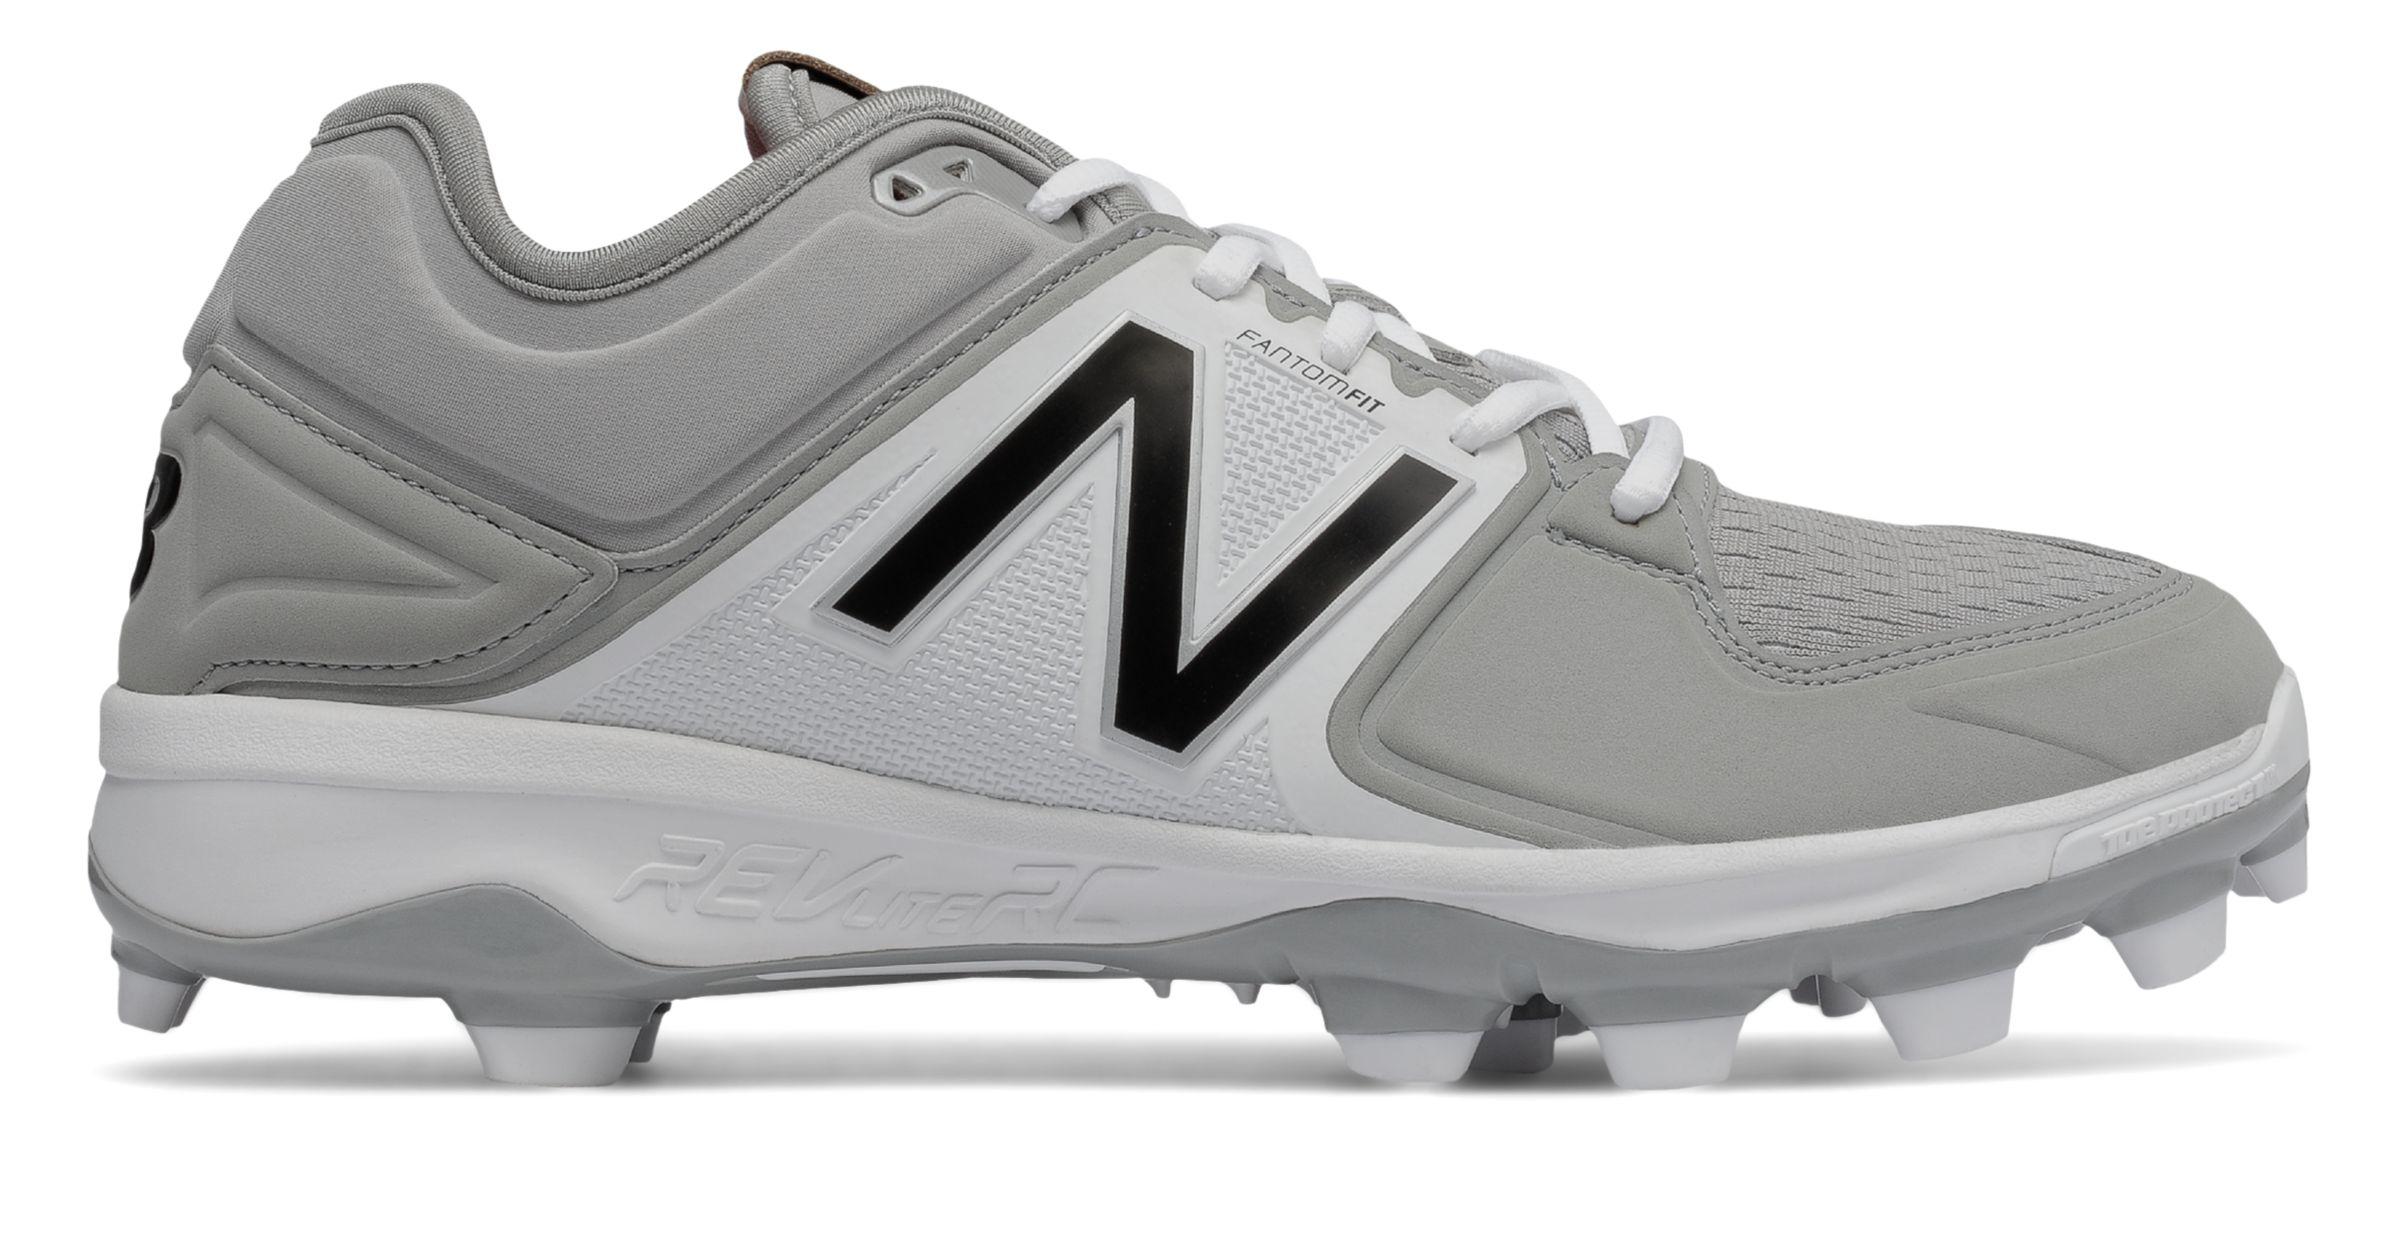 New Balance Low-Cut 3000v3 TPU Baseball Cleat Mens Shoes Grey with ... cc0bf2c0ecd